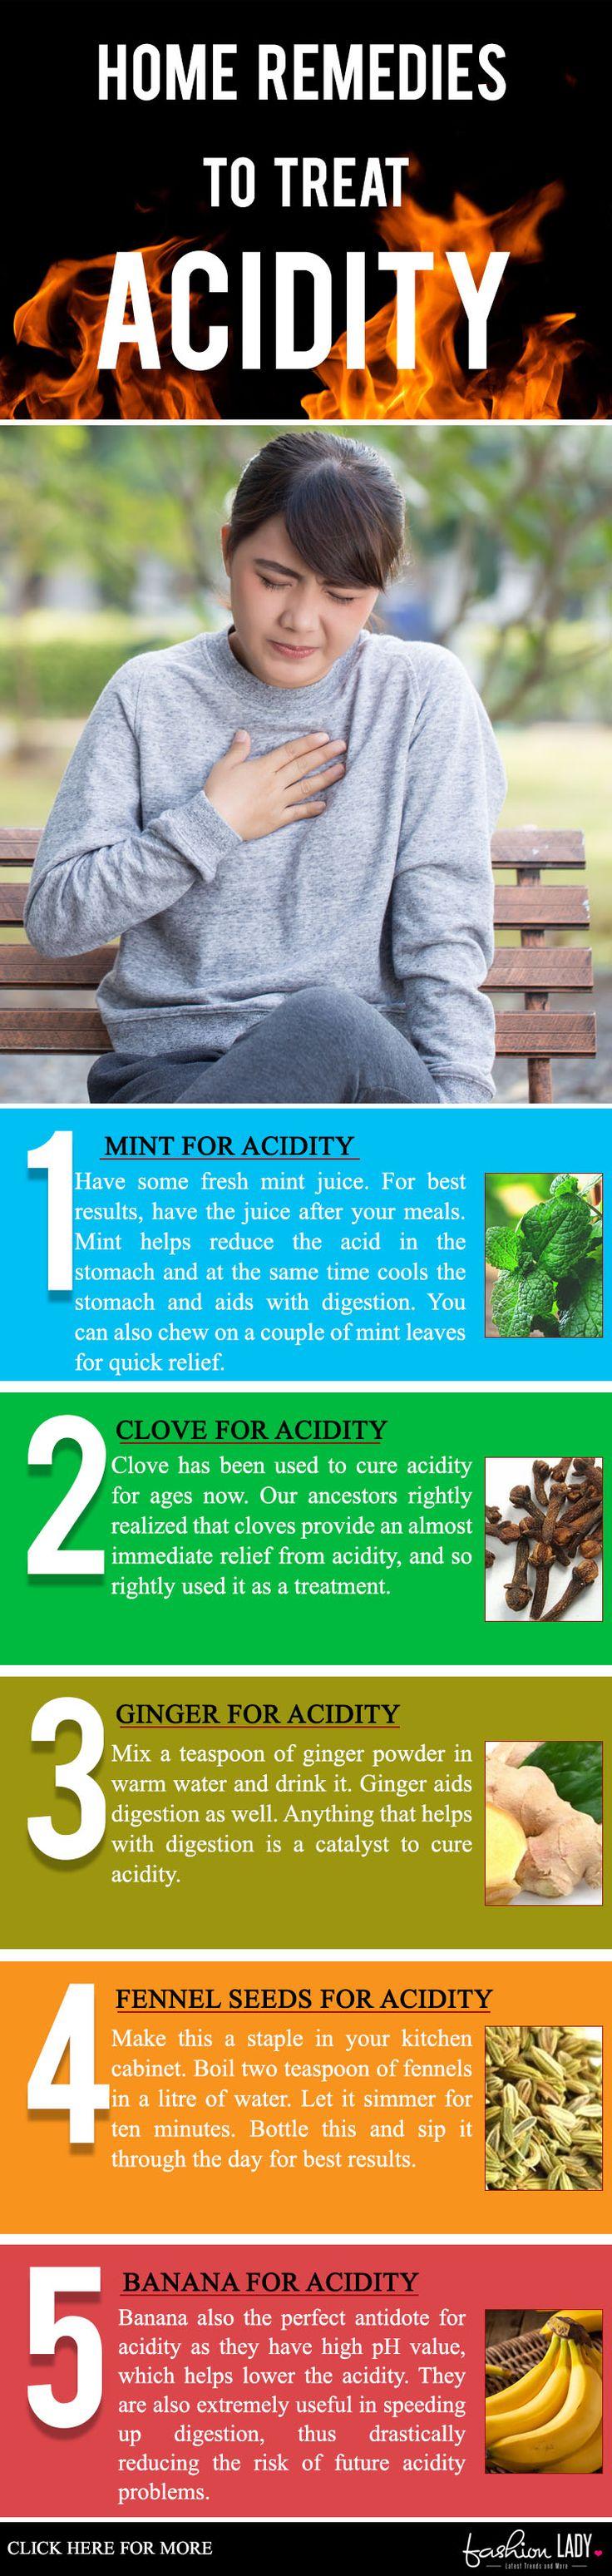 Home Remedies To Treat Acidity